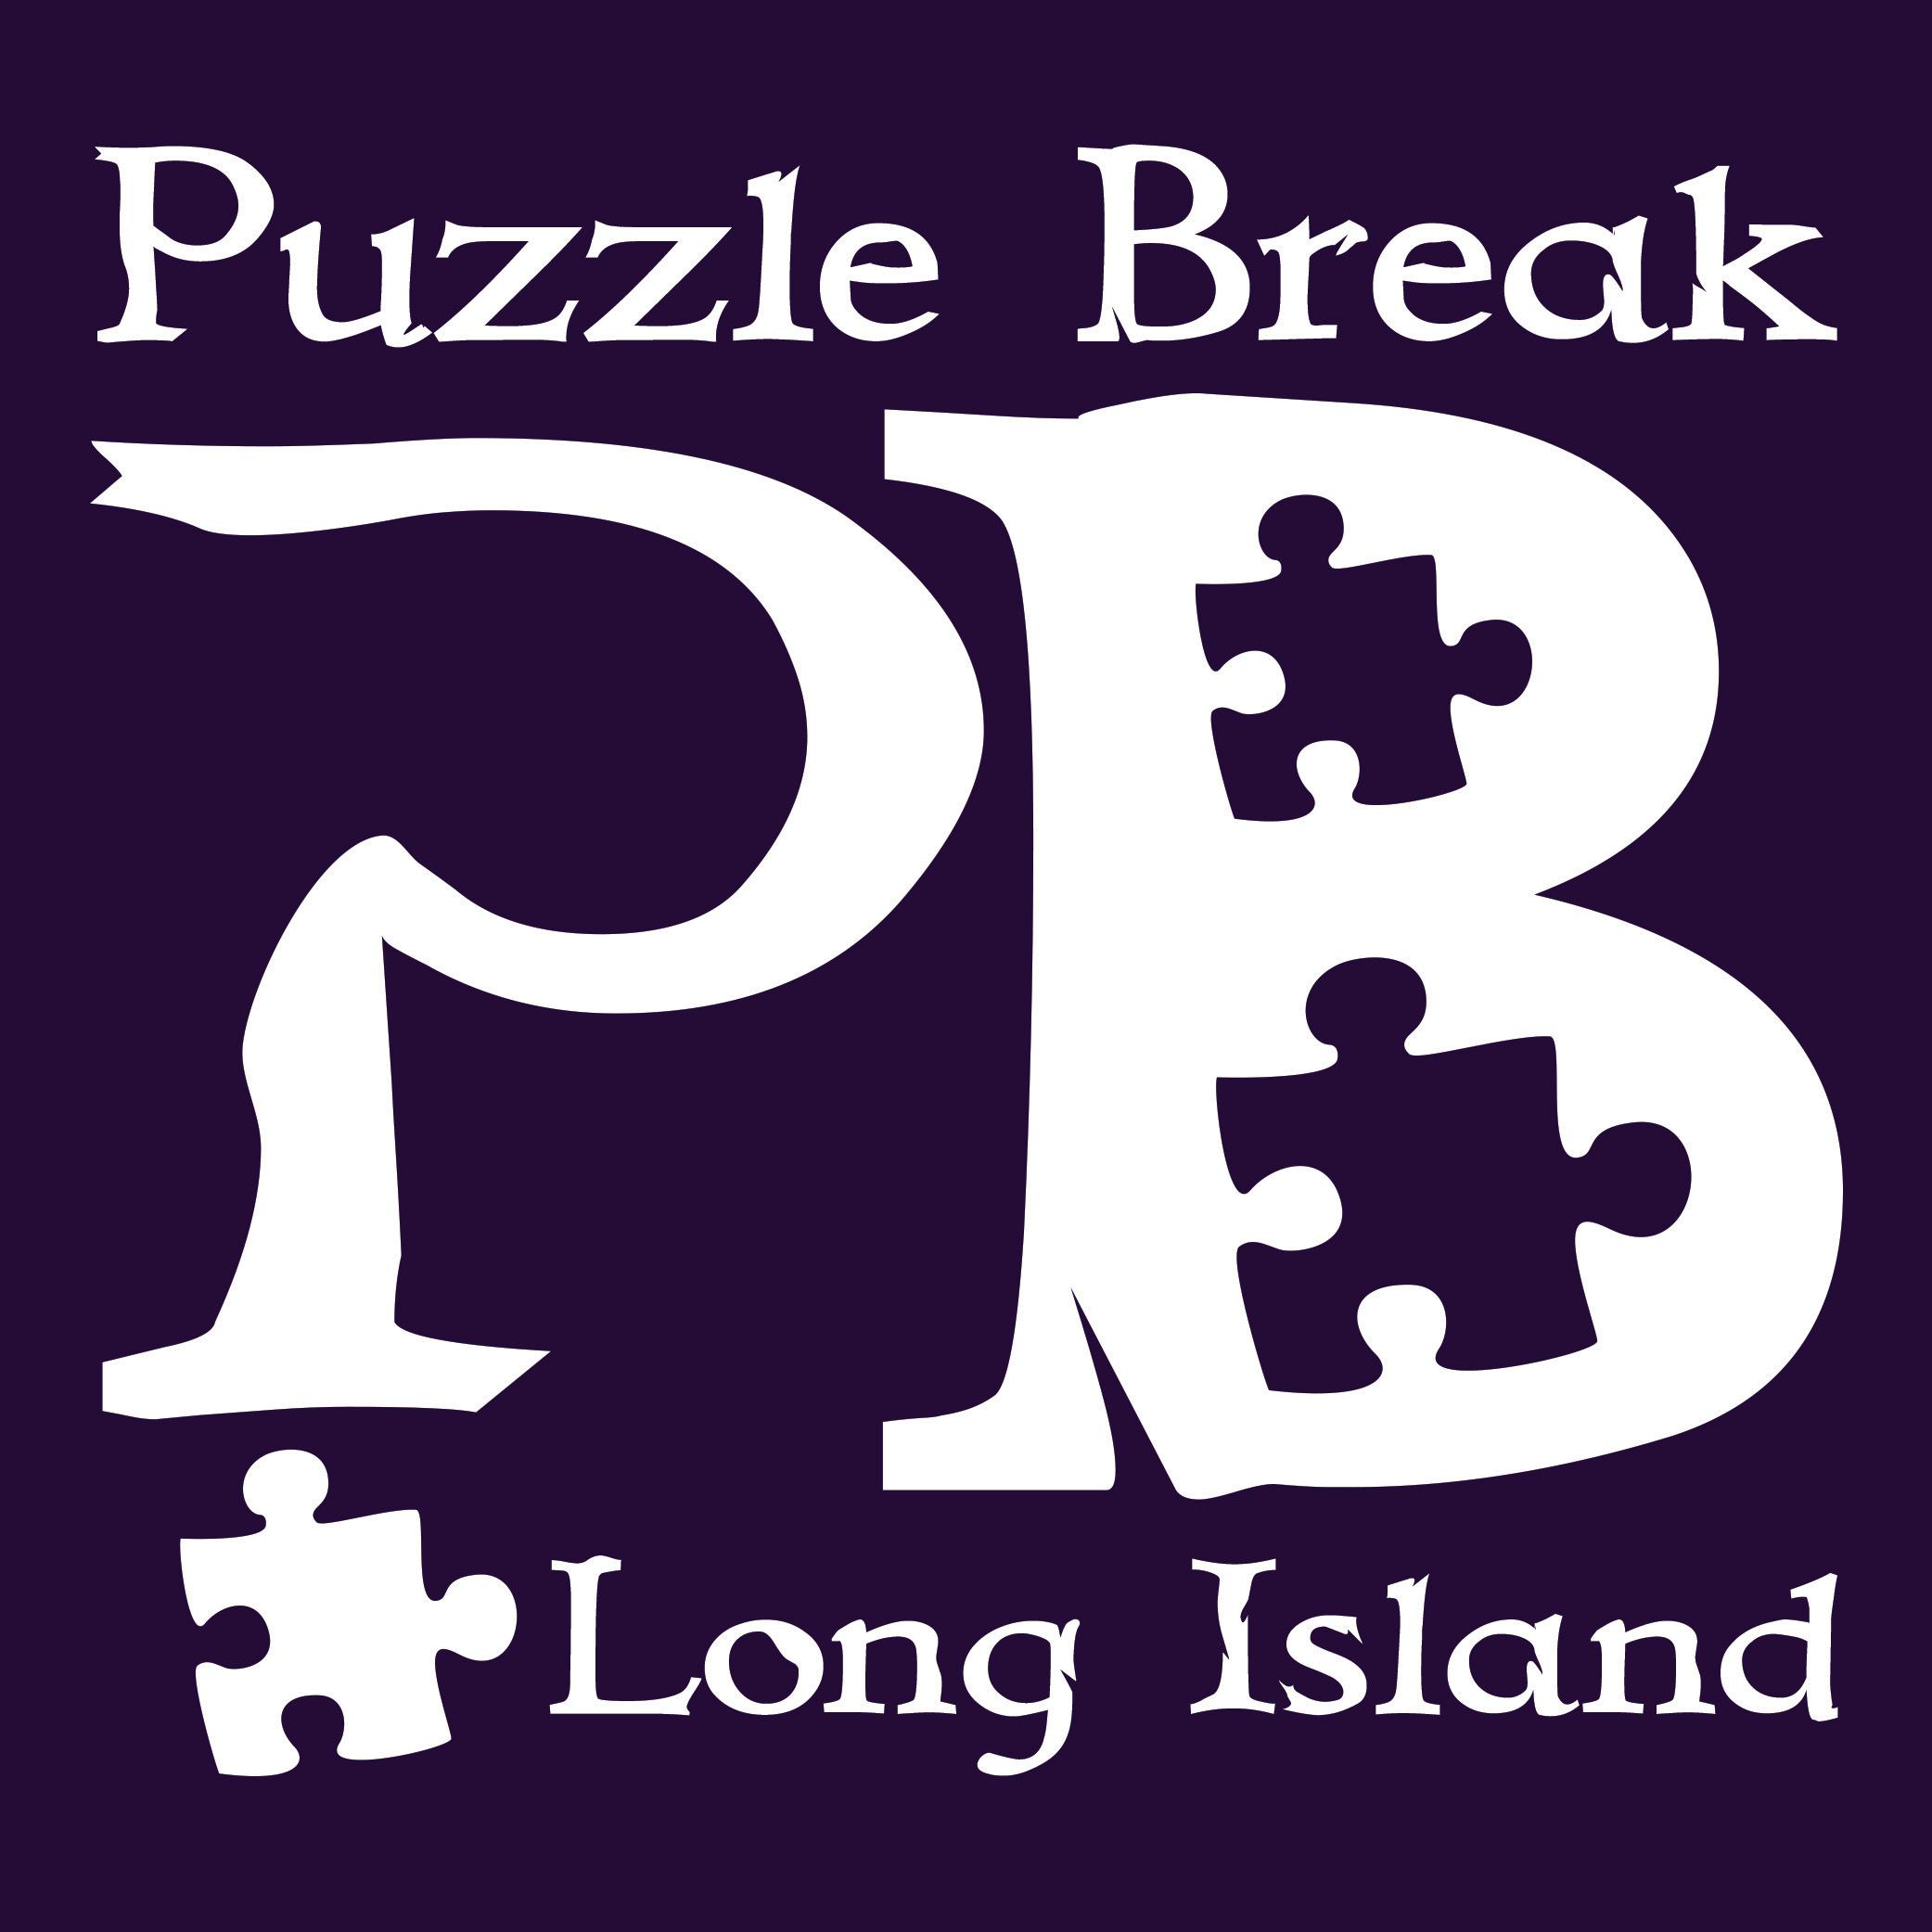 Puzzle Break Long Island